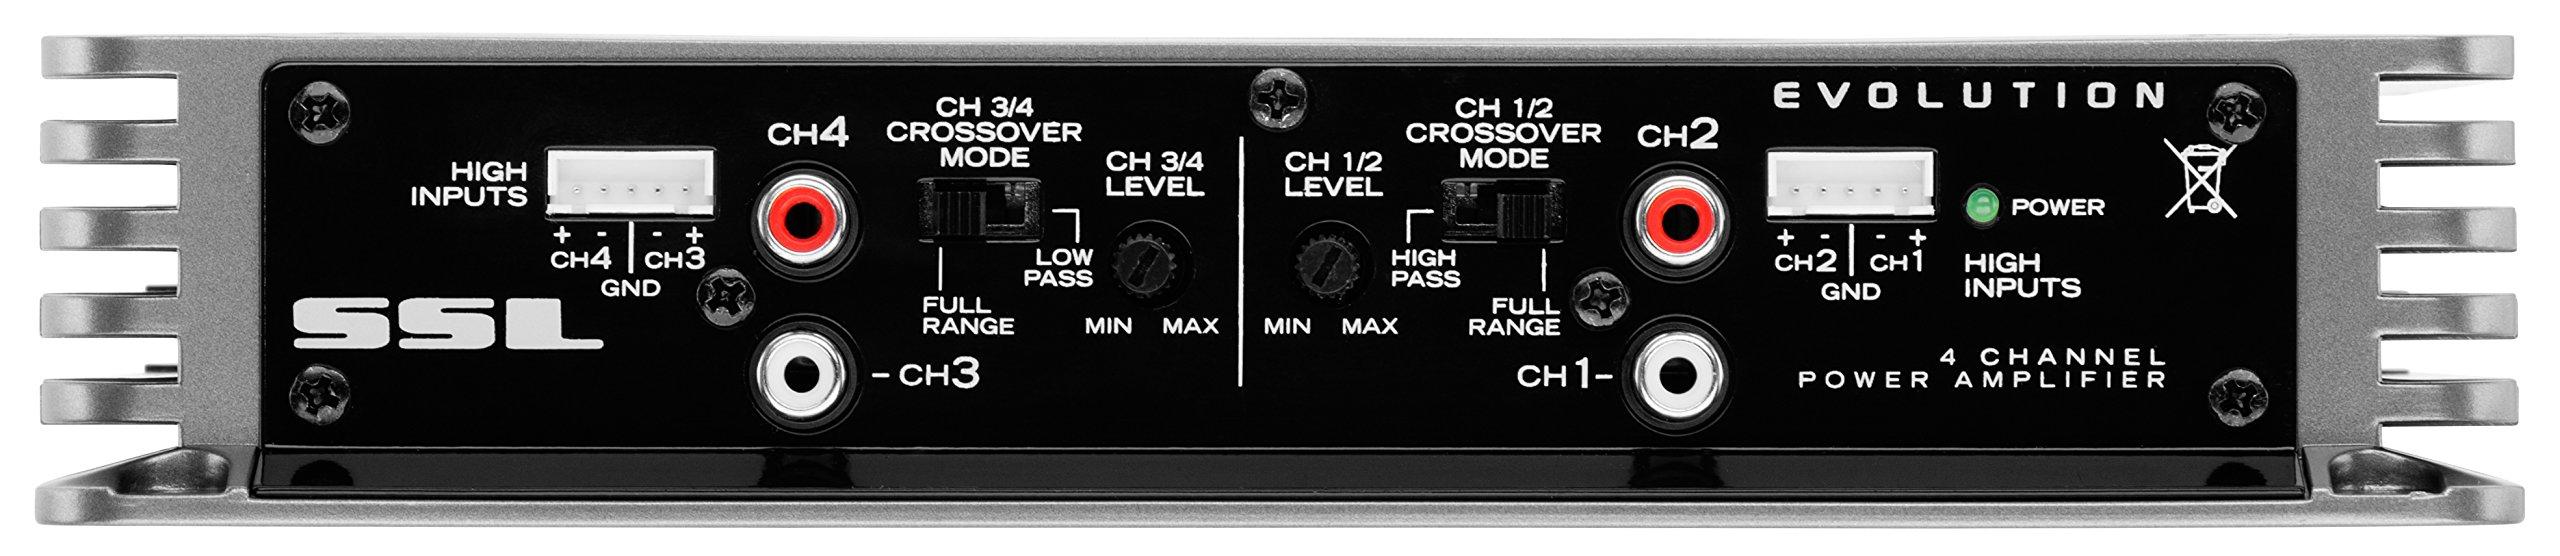 Sound Storm EV4.400 Evolution 400 Watt, 4 Channel, 2 to 8 Ohm Stable Class A/B, Full Range Car Amplifier by Sound Storm Laboratories (Image #3)